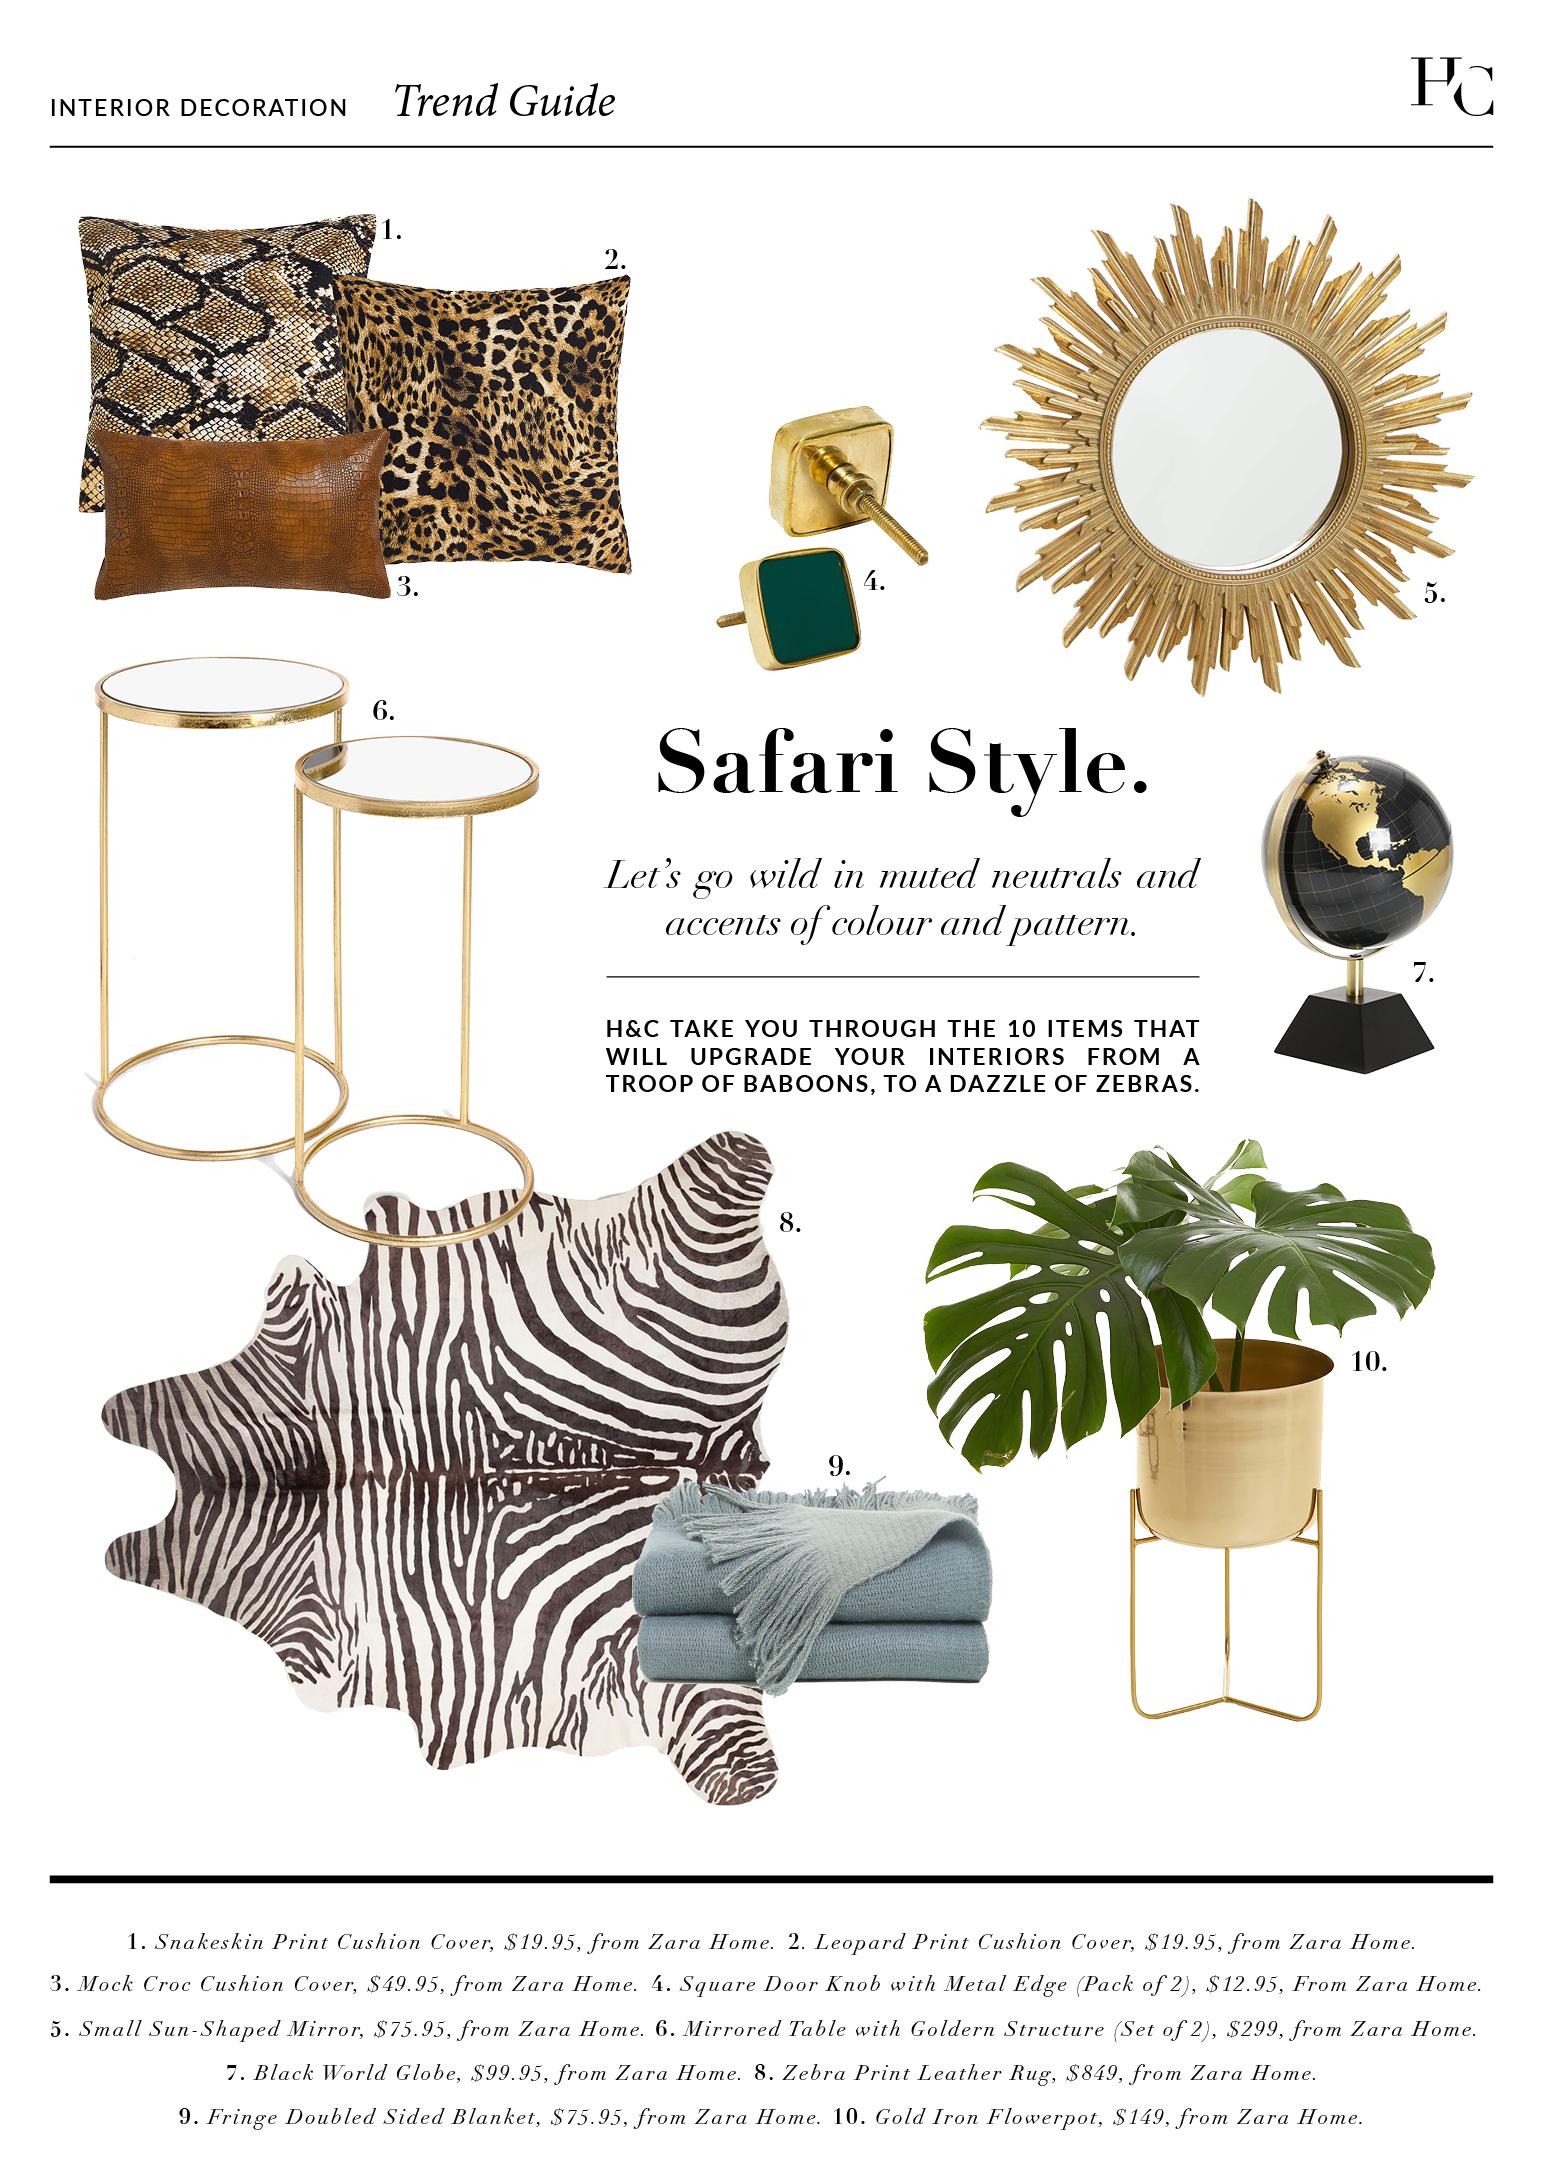 Trend Guide: Safari Style, House & Court, Interior Design, Sydney